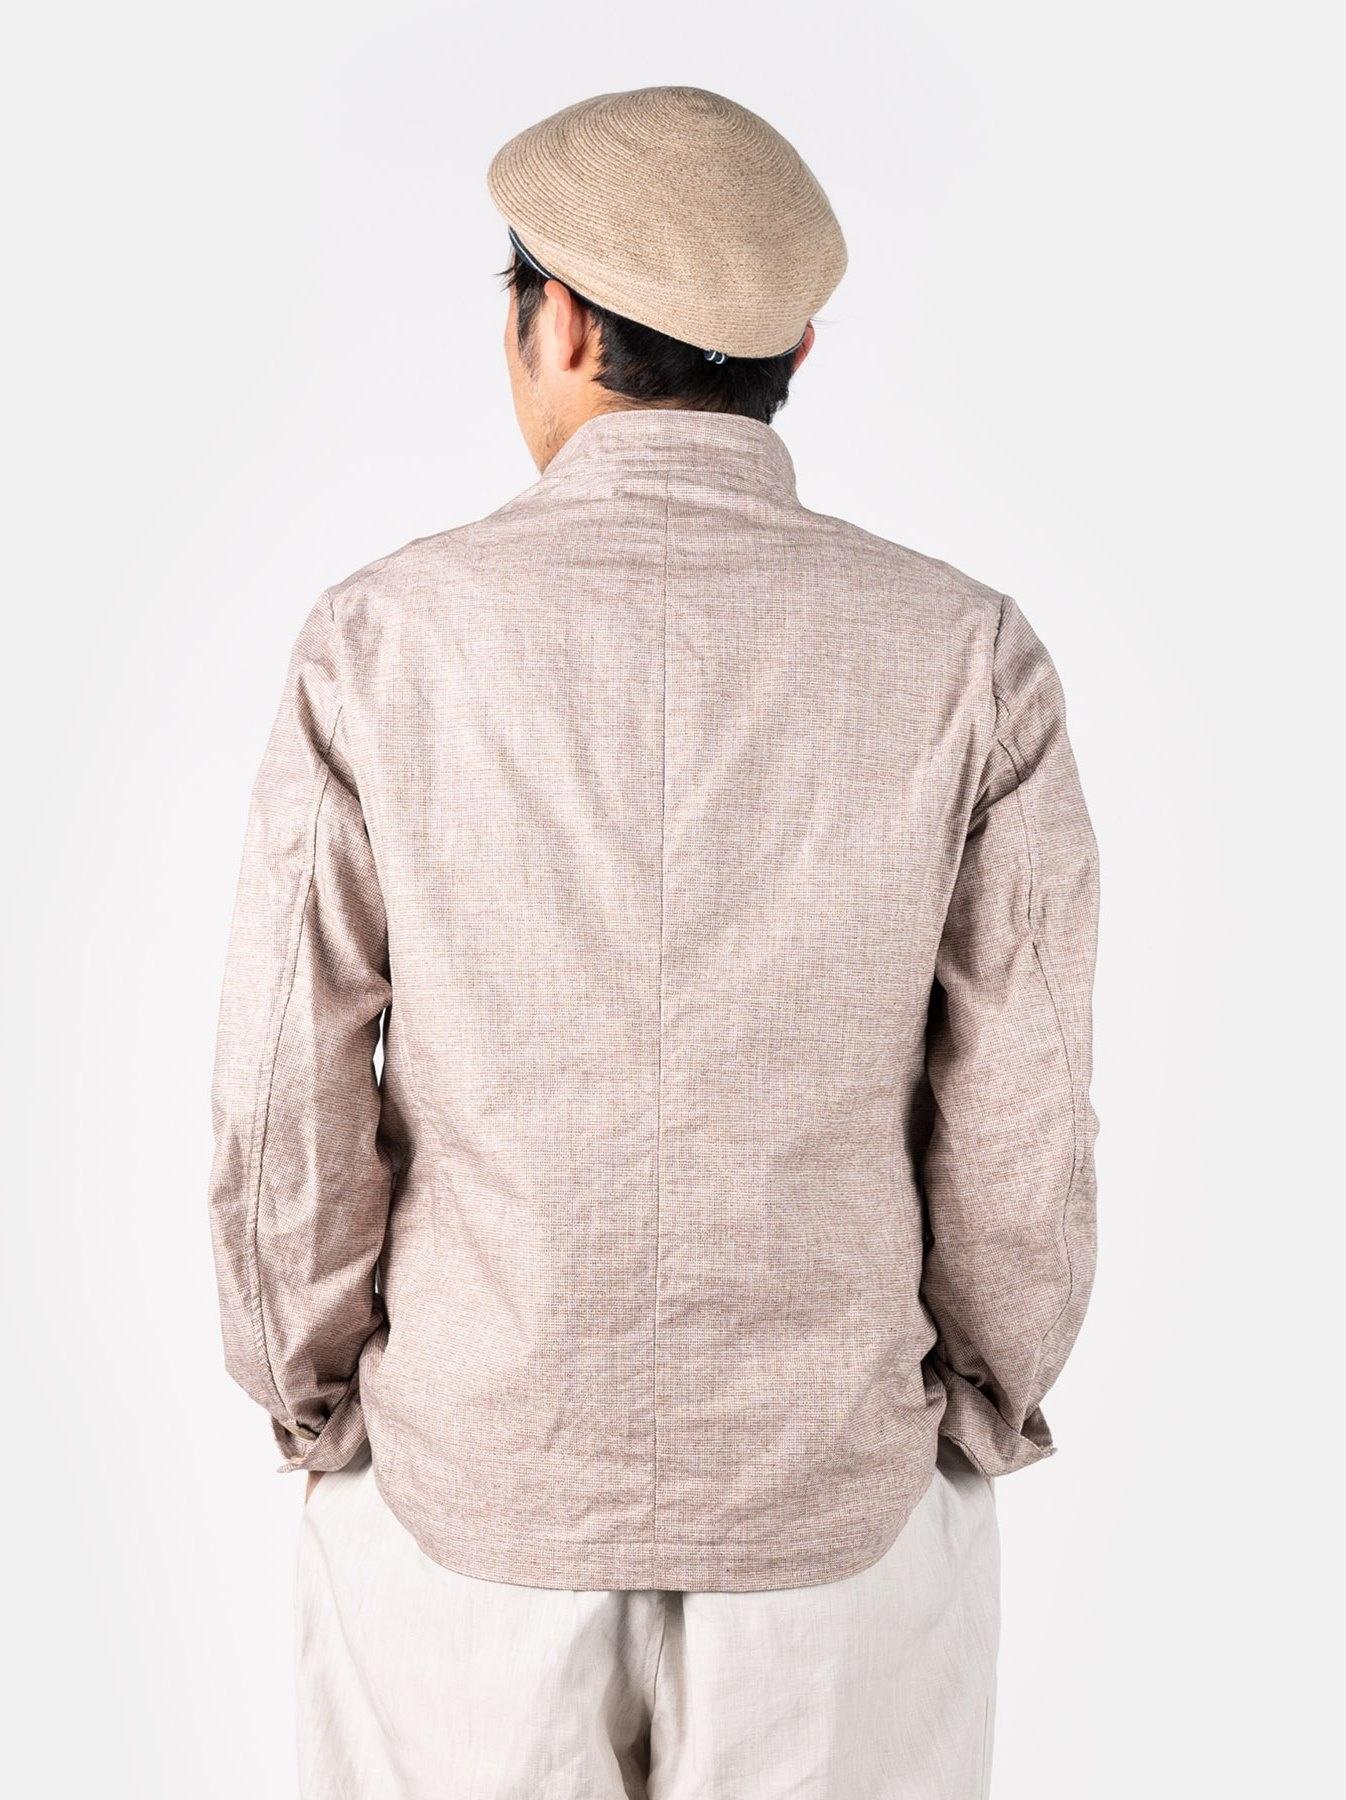 Cotton Tweed 908 Jacket-5